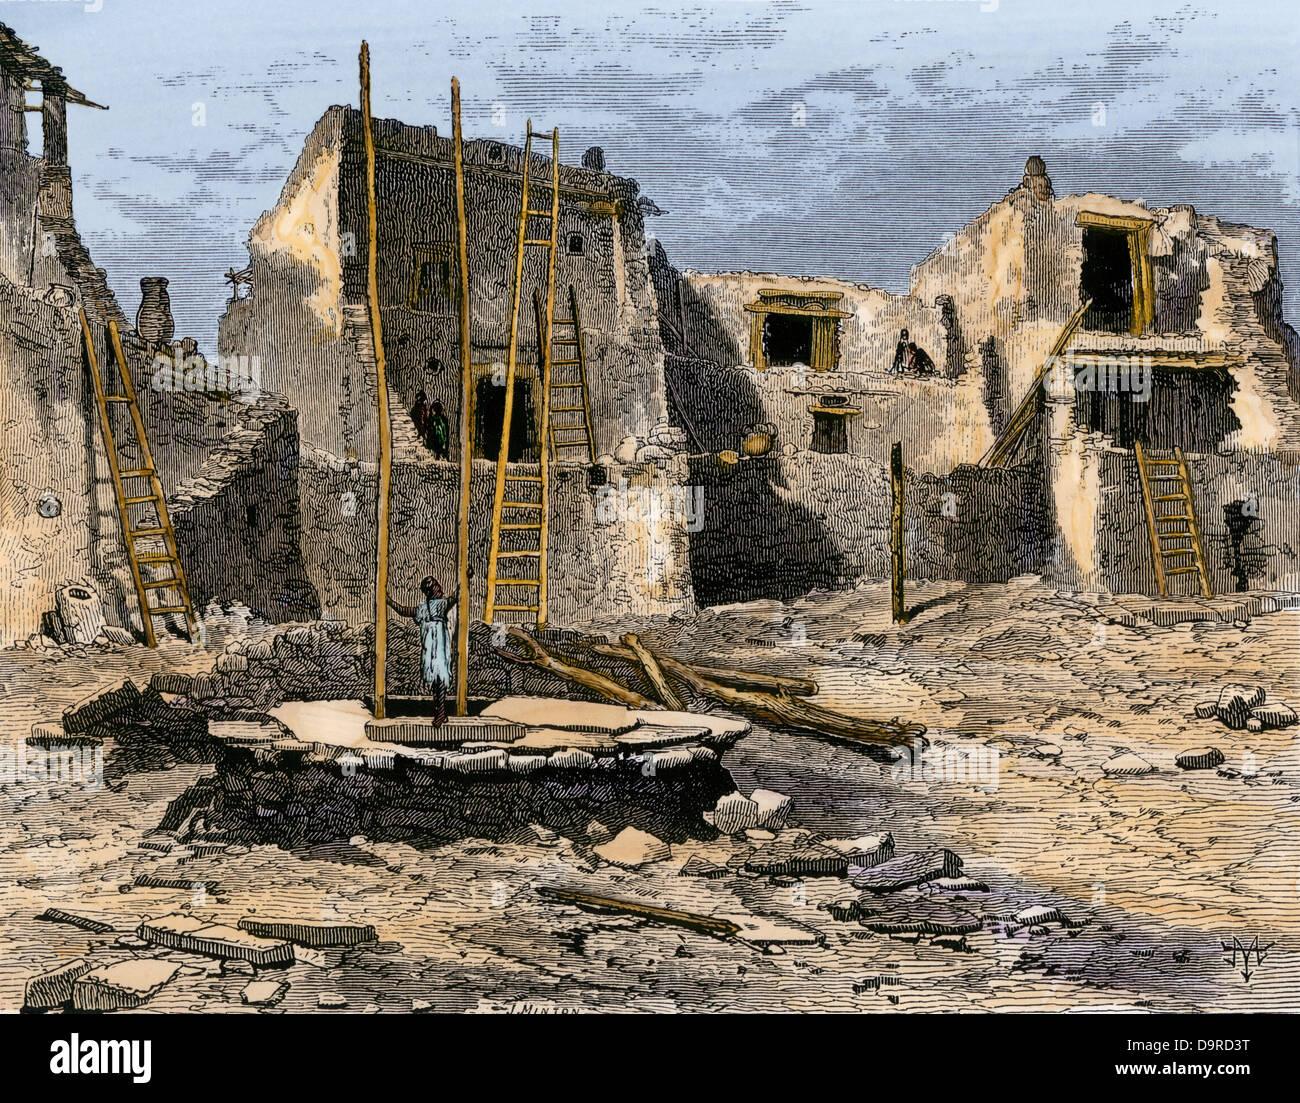 Heritage Homes Floor Plans Hopi Village Of Oraibi From John Wesley Powell S